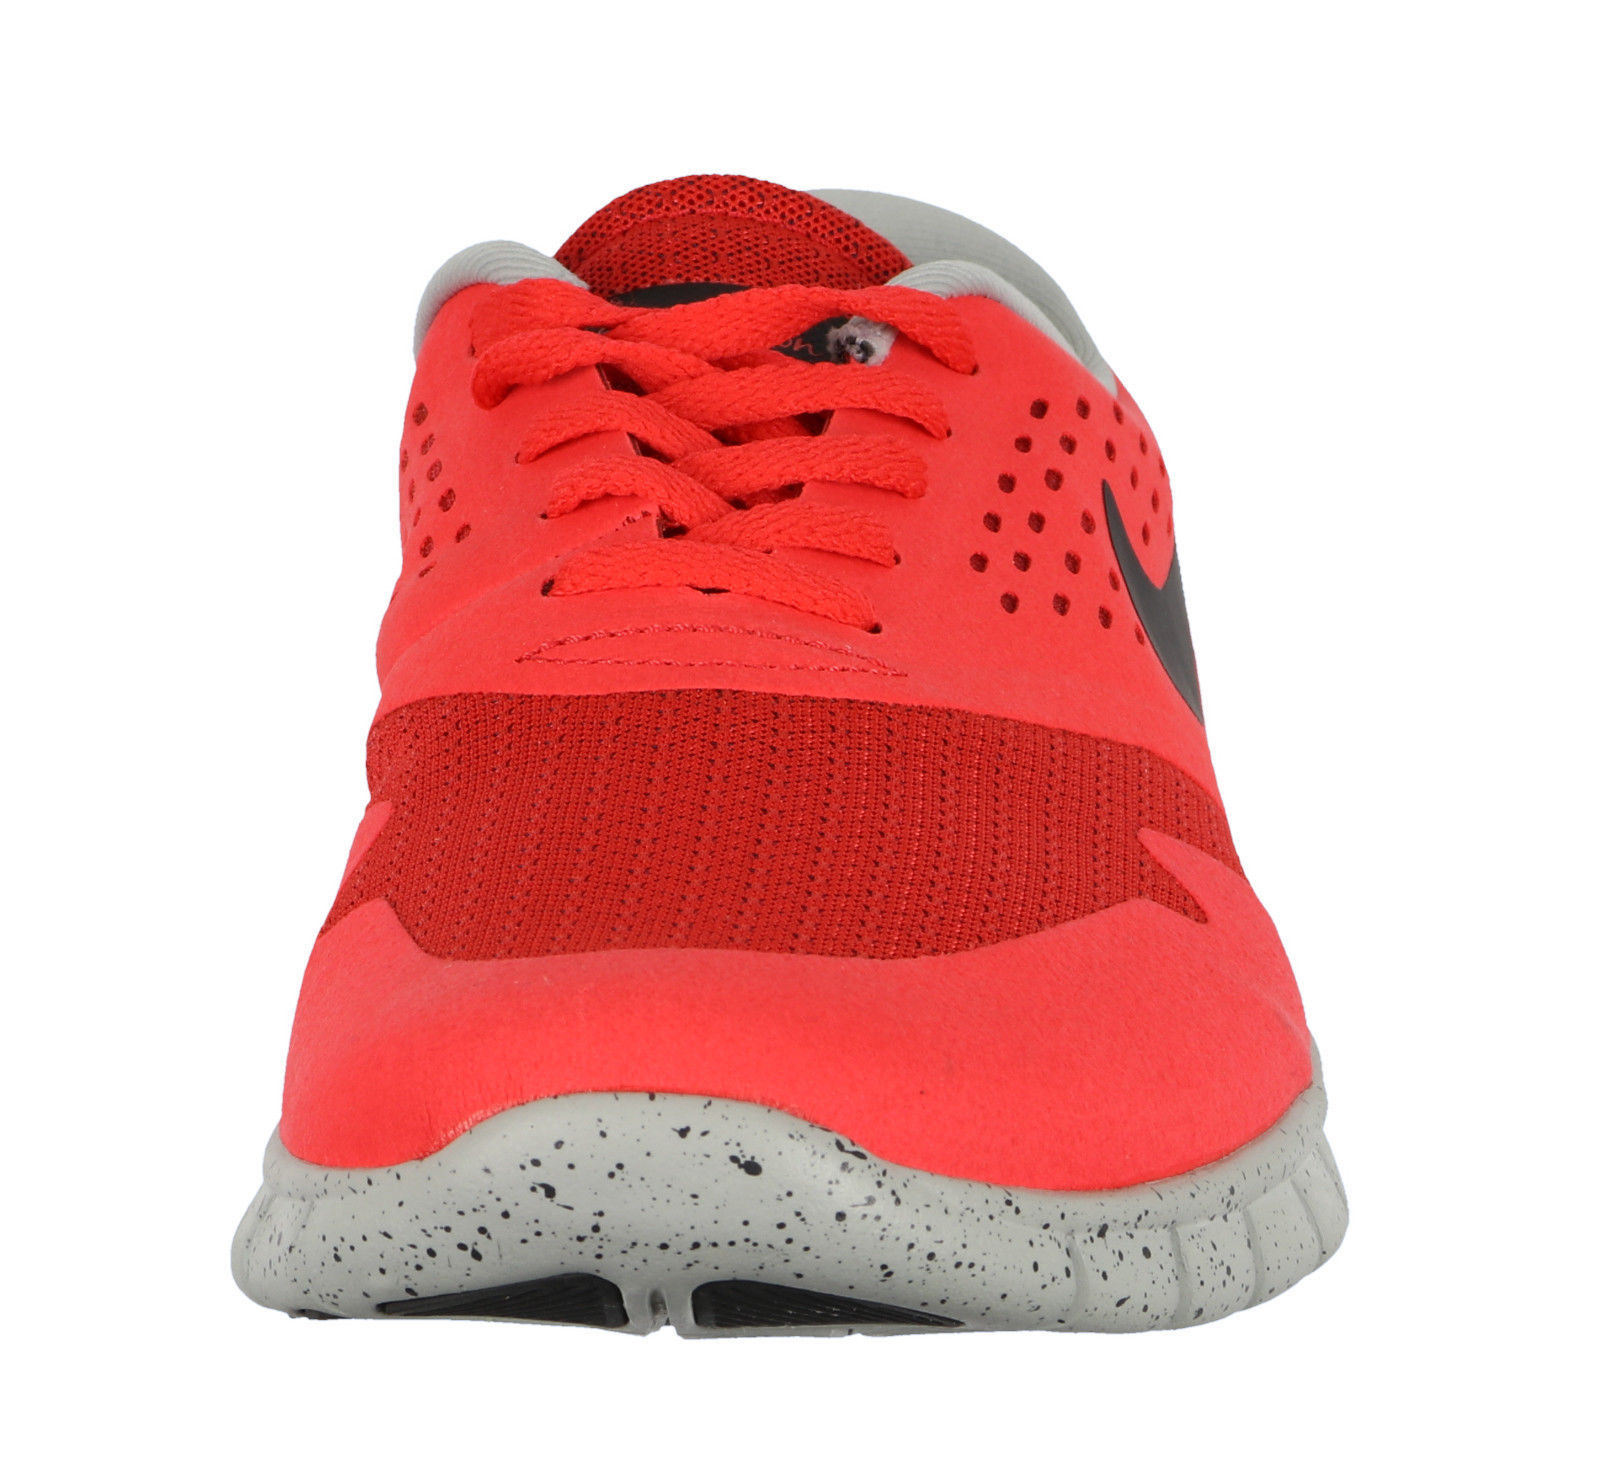 the latest d6621 0aff5 NIKE SB Eric Koston 2 Max Skateboarding Shoes sz 10 Crimson Red Black Gray